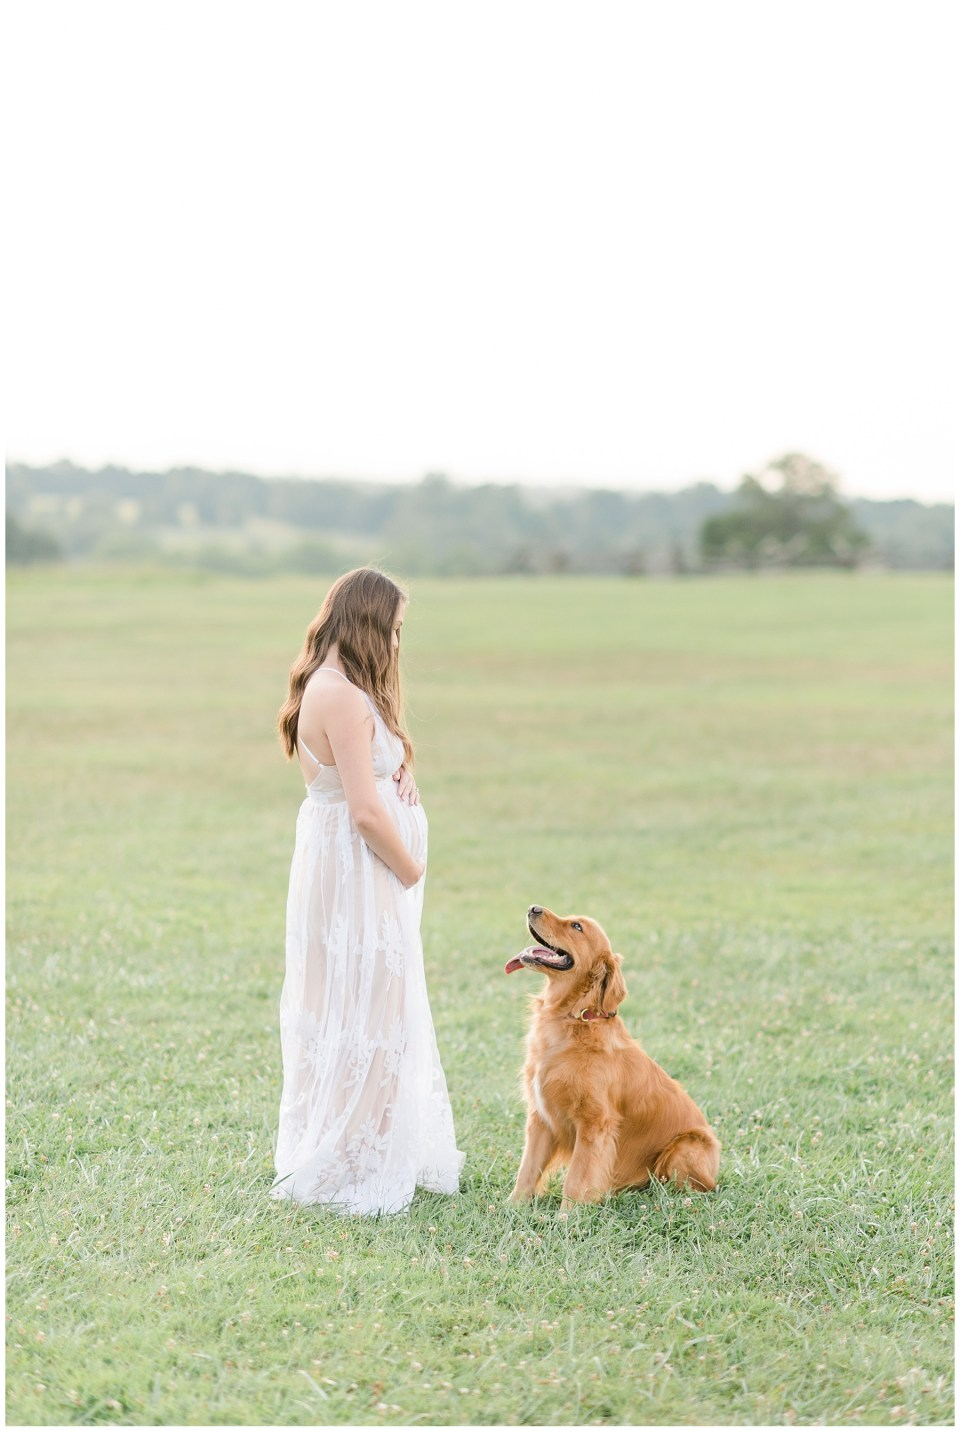 cute-maternity-photo-ideas-with-dog-virginia-maternity-photographer